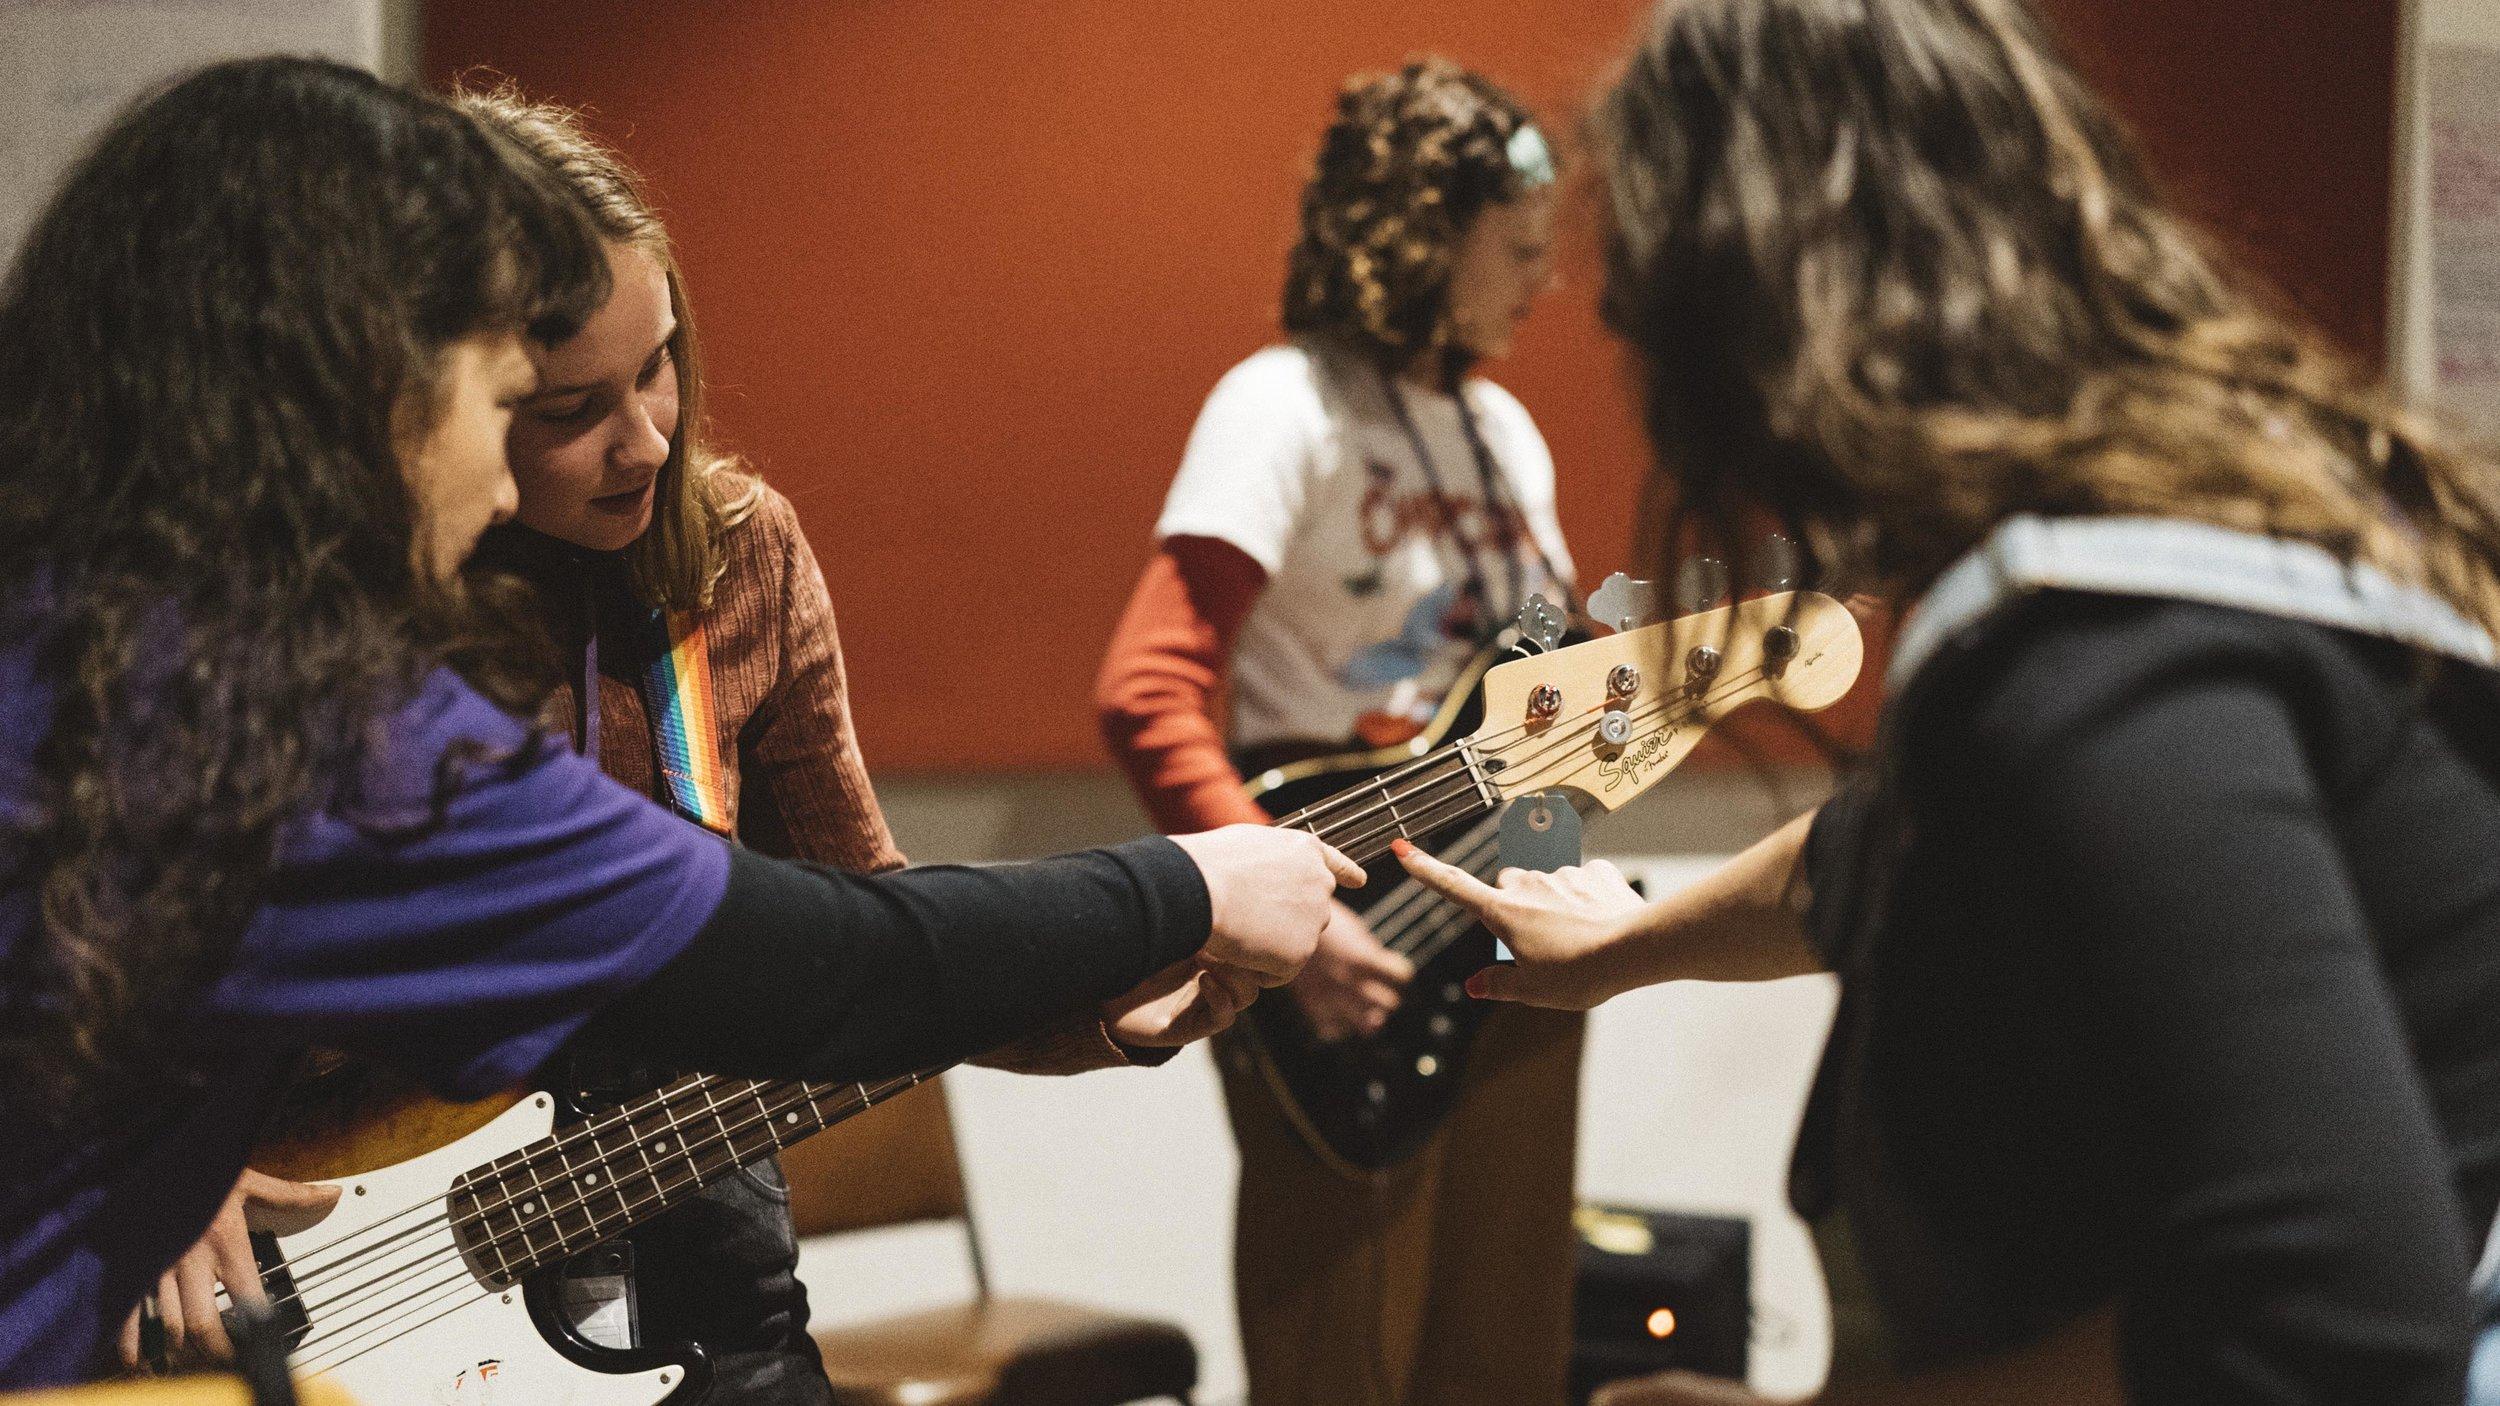 Photo: Girls Rock! Melbourne mentors Jade Stevens and Kelly-Dawn Hellmrich assisting a camper during bass instrument instruction. Photo credit: Sianne van Abkoude.